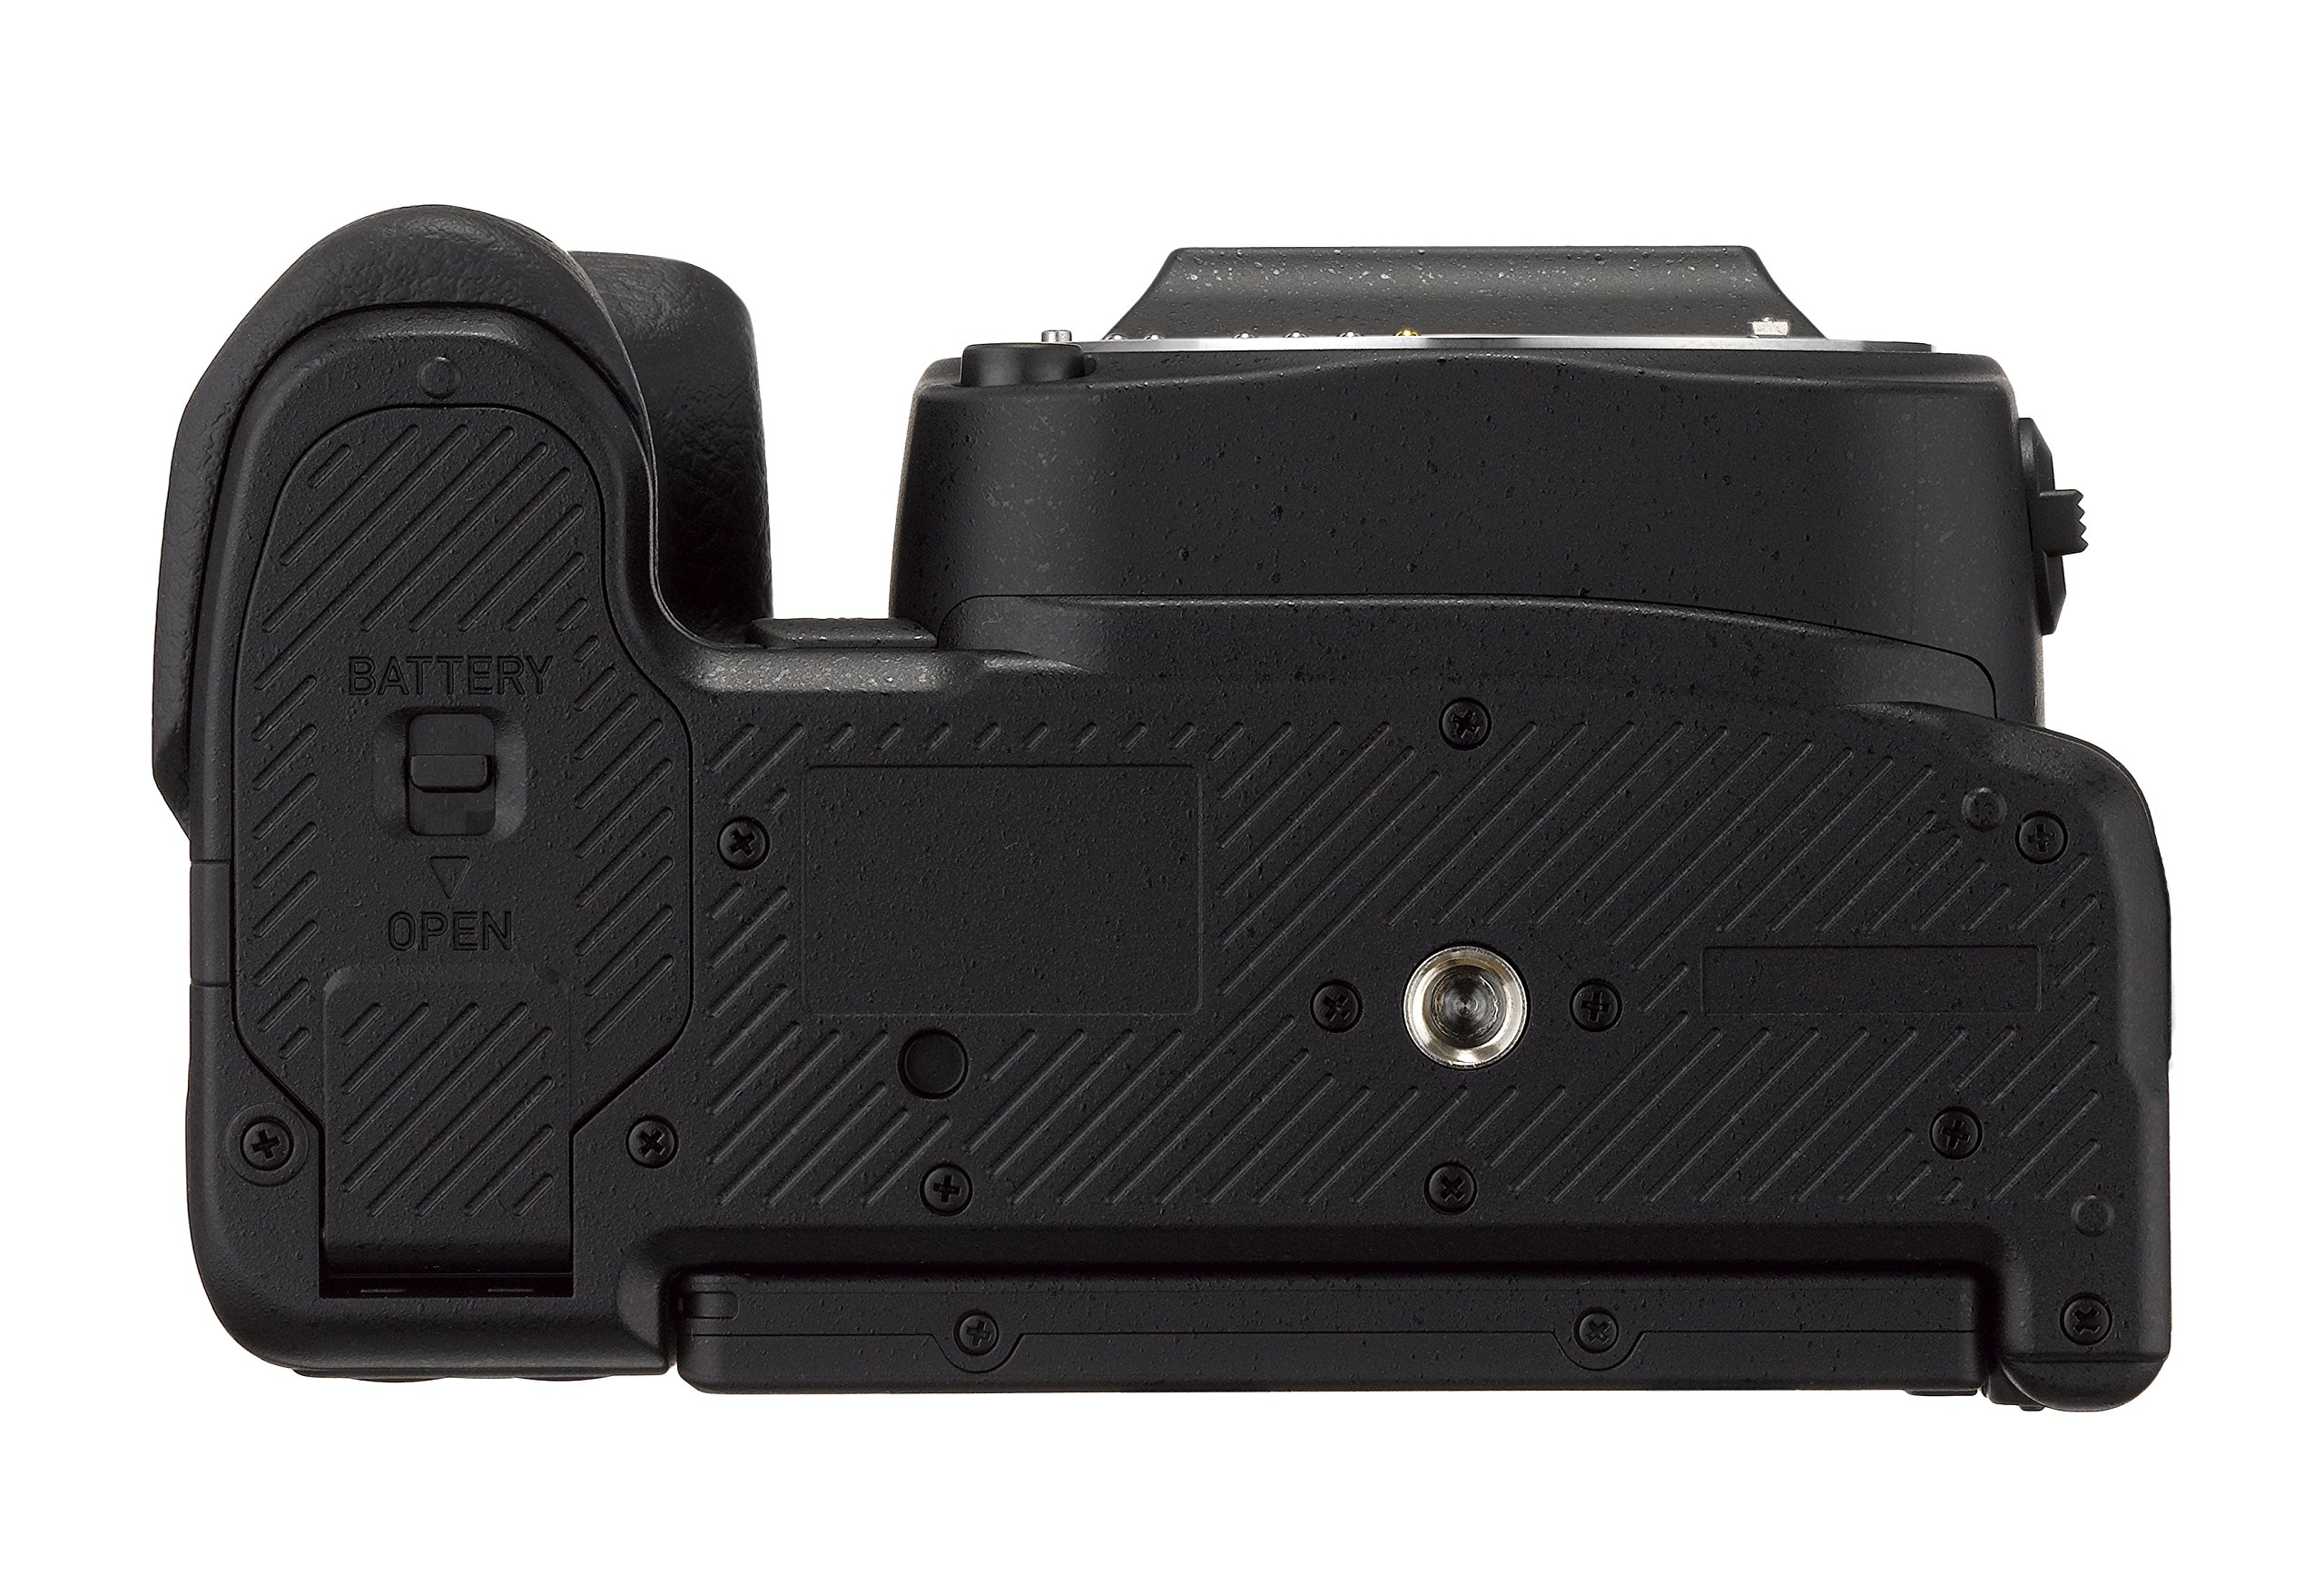 Pentax K-70 Weather-Sealed DSLR Camera, Body Only (Black) by Pentax (Image #4)